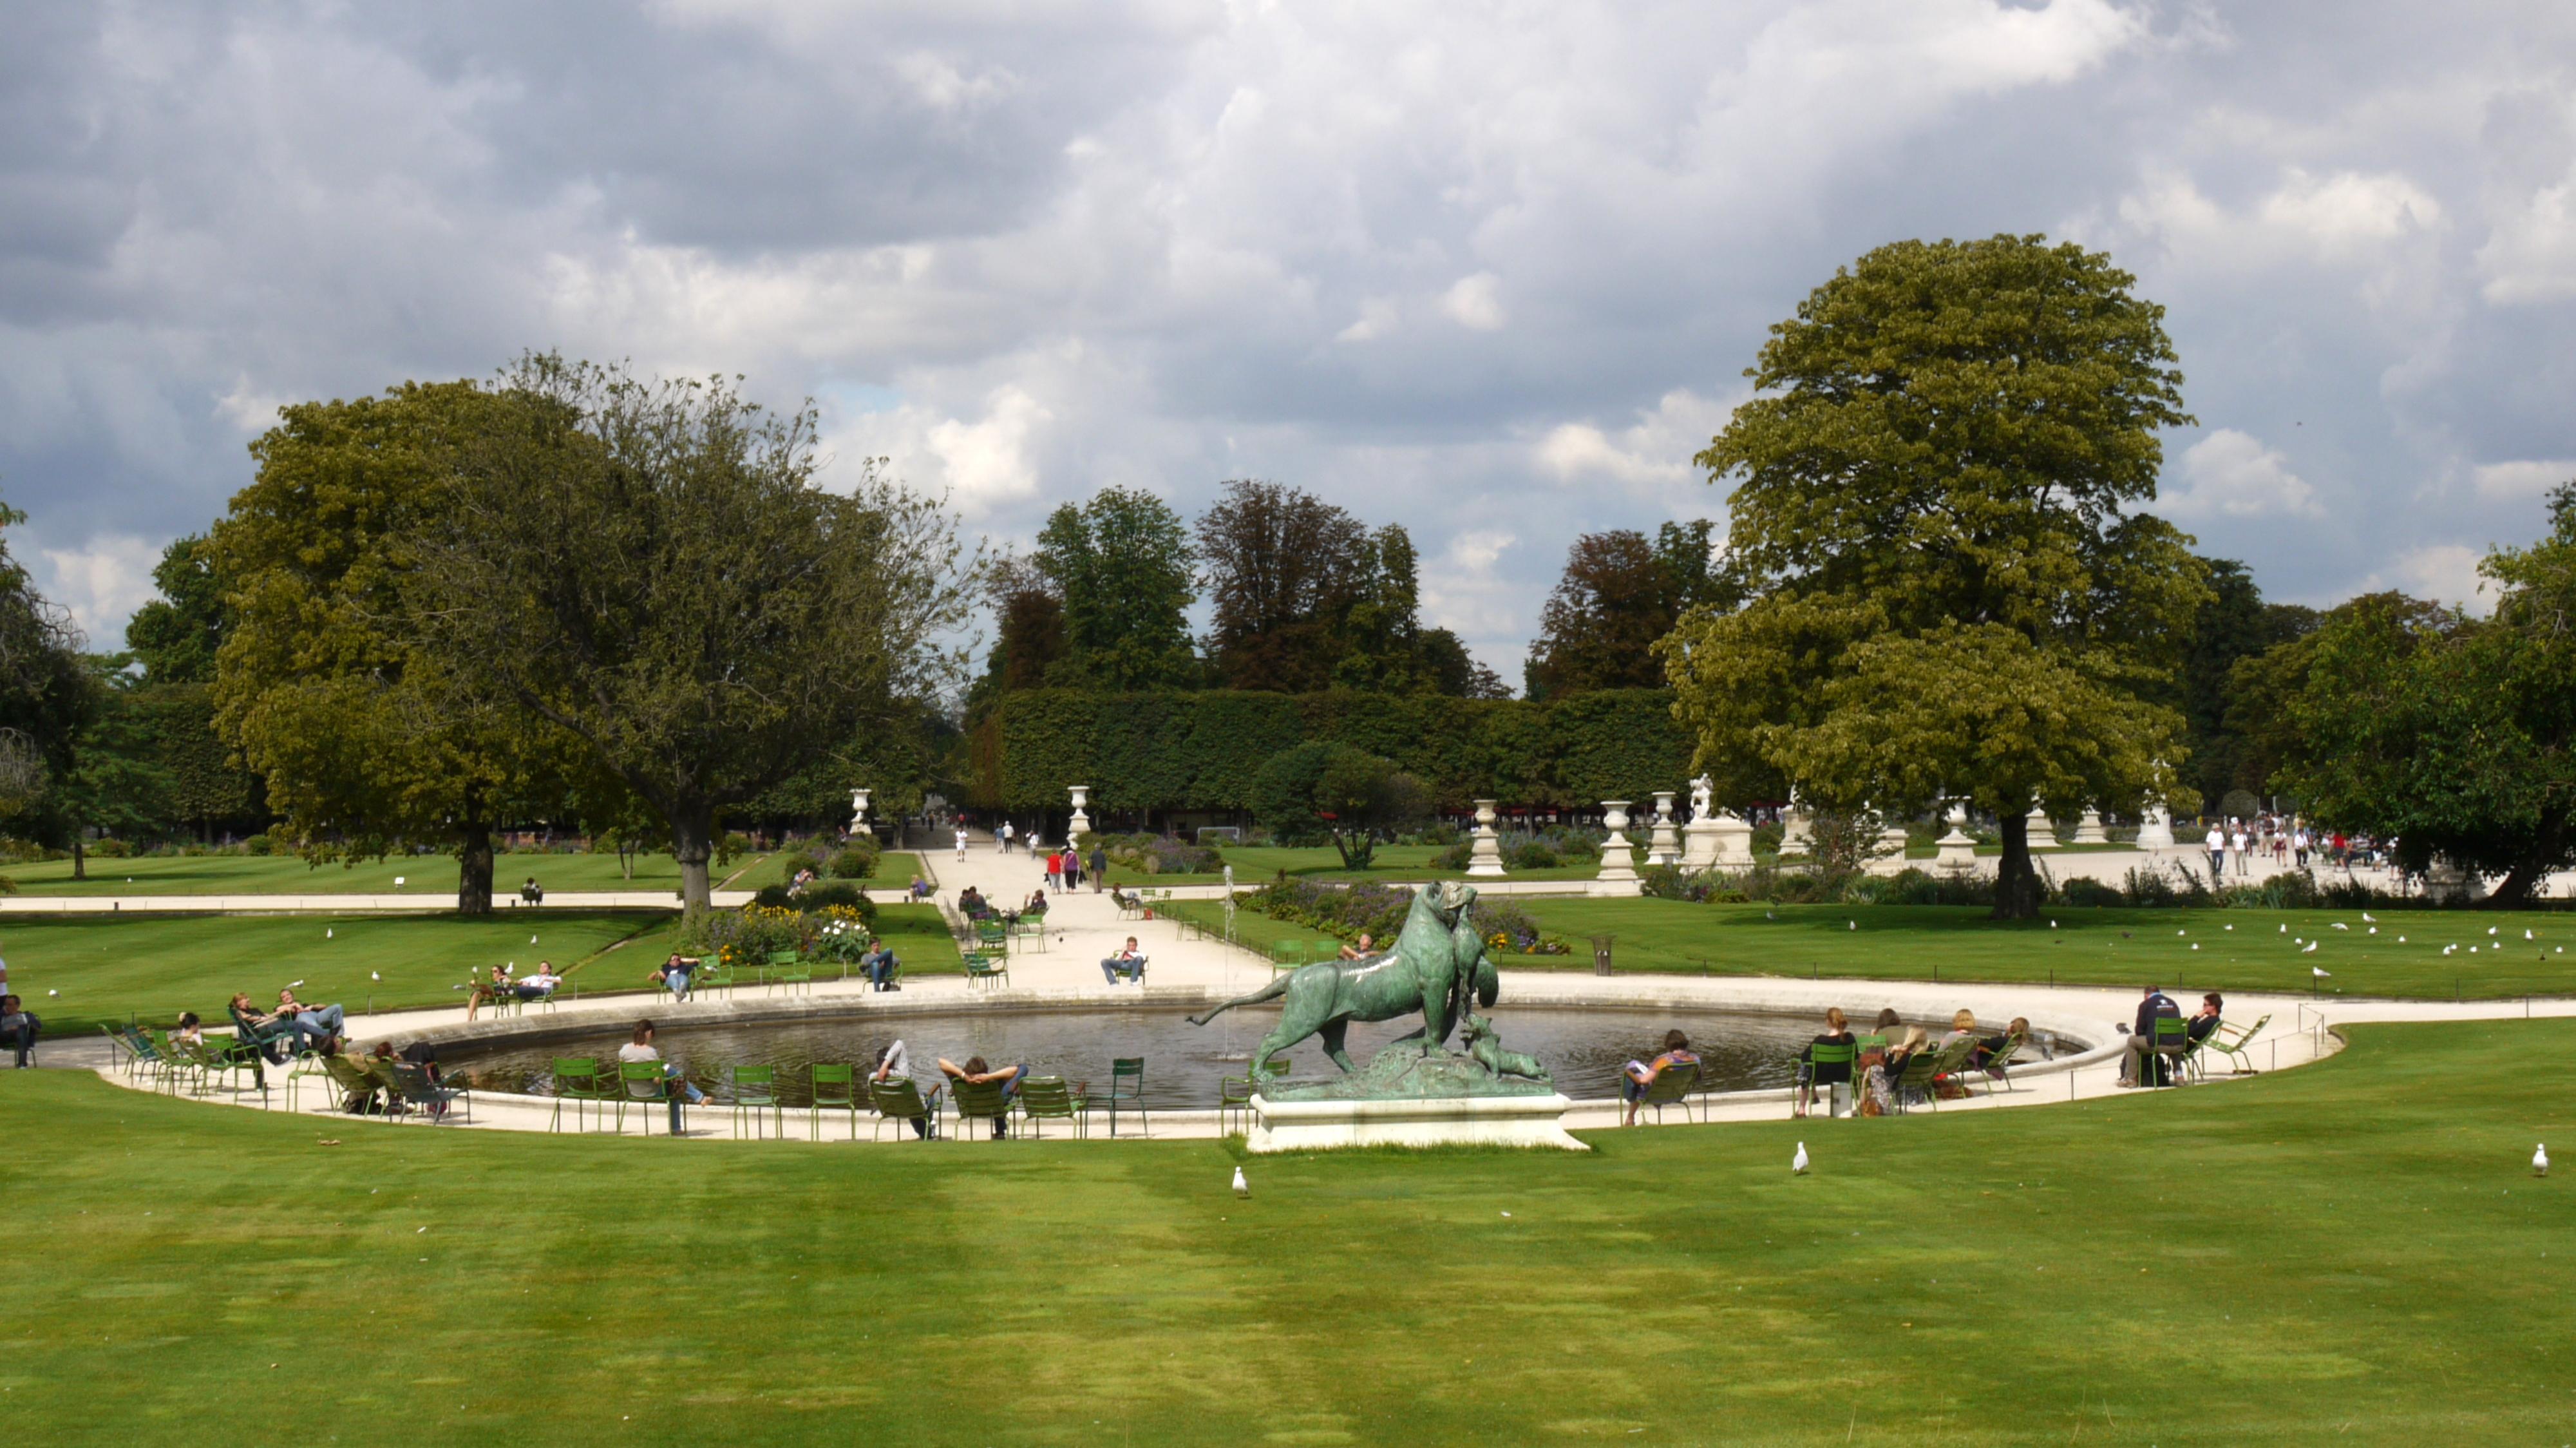 Tuileries - Plan detaille du jardin des tuileries ...